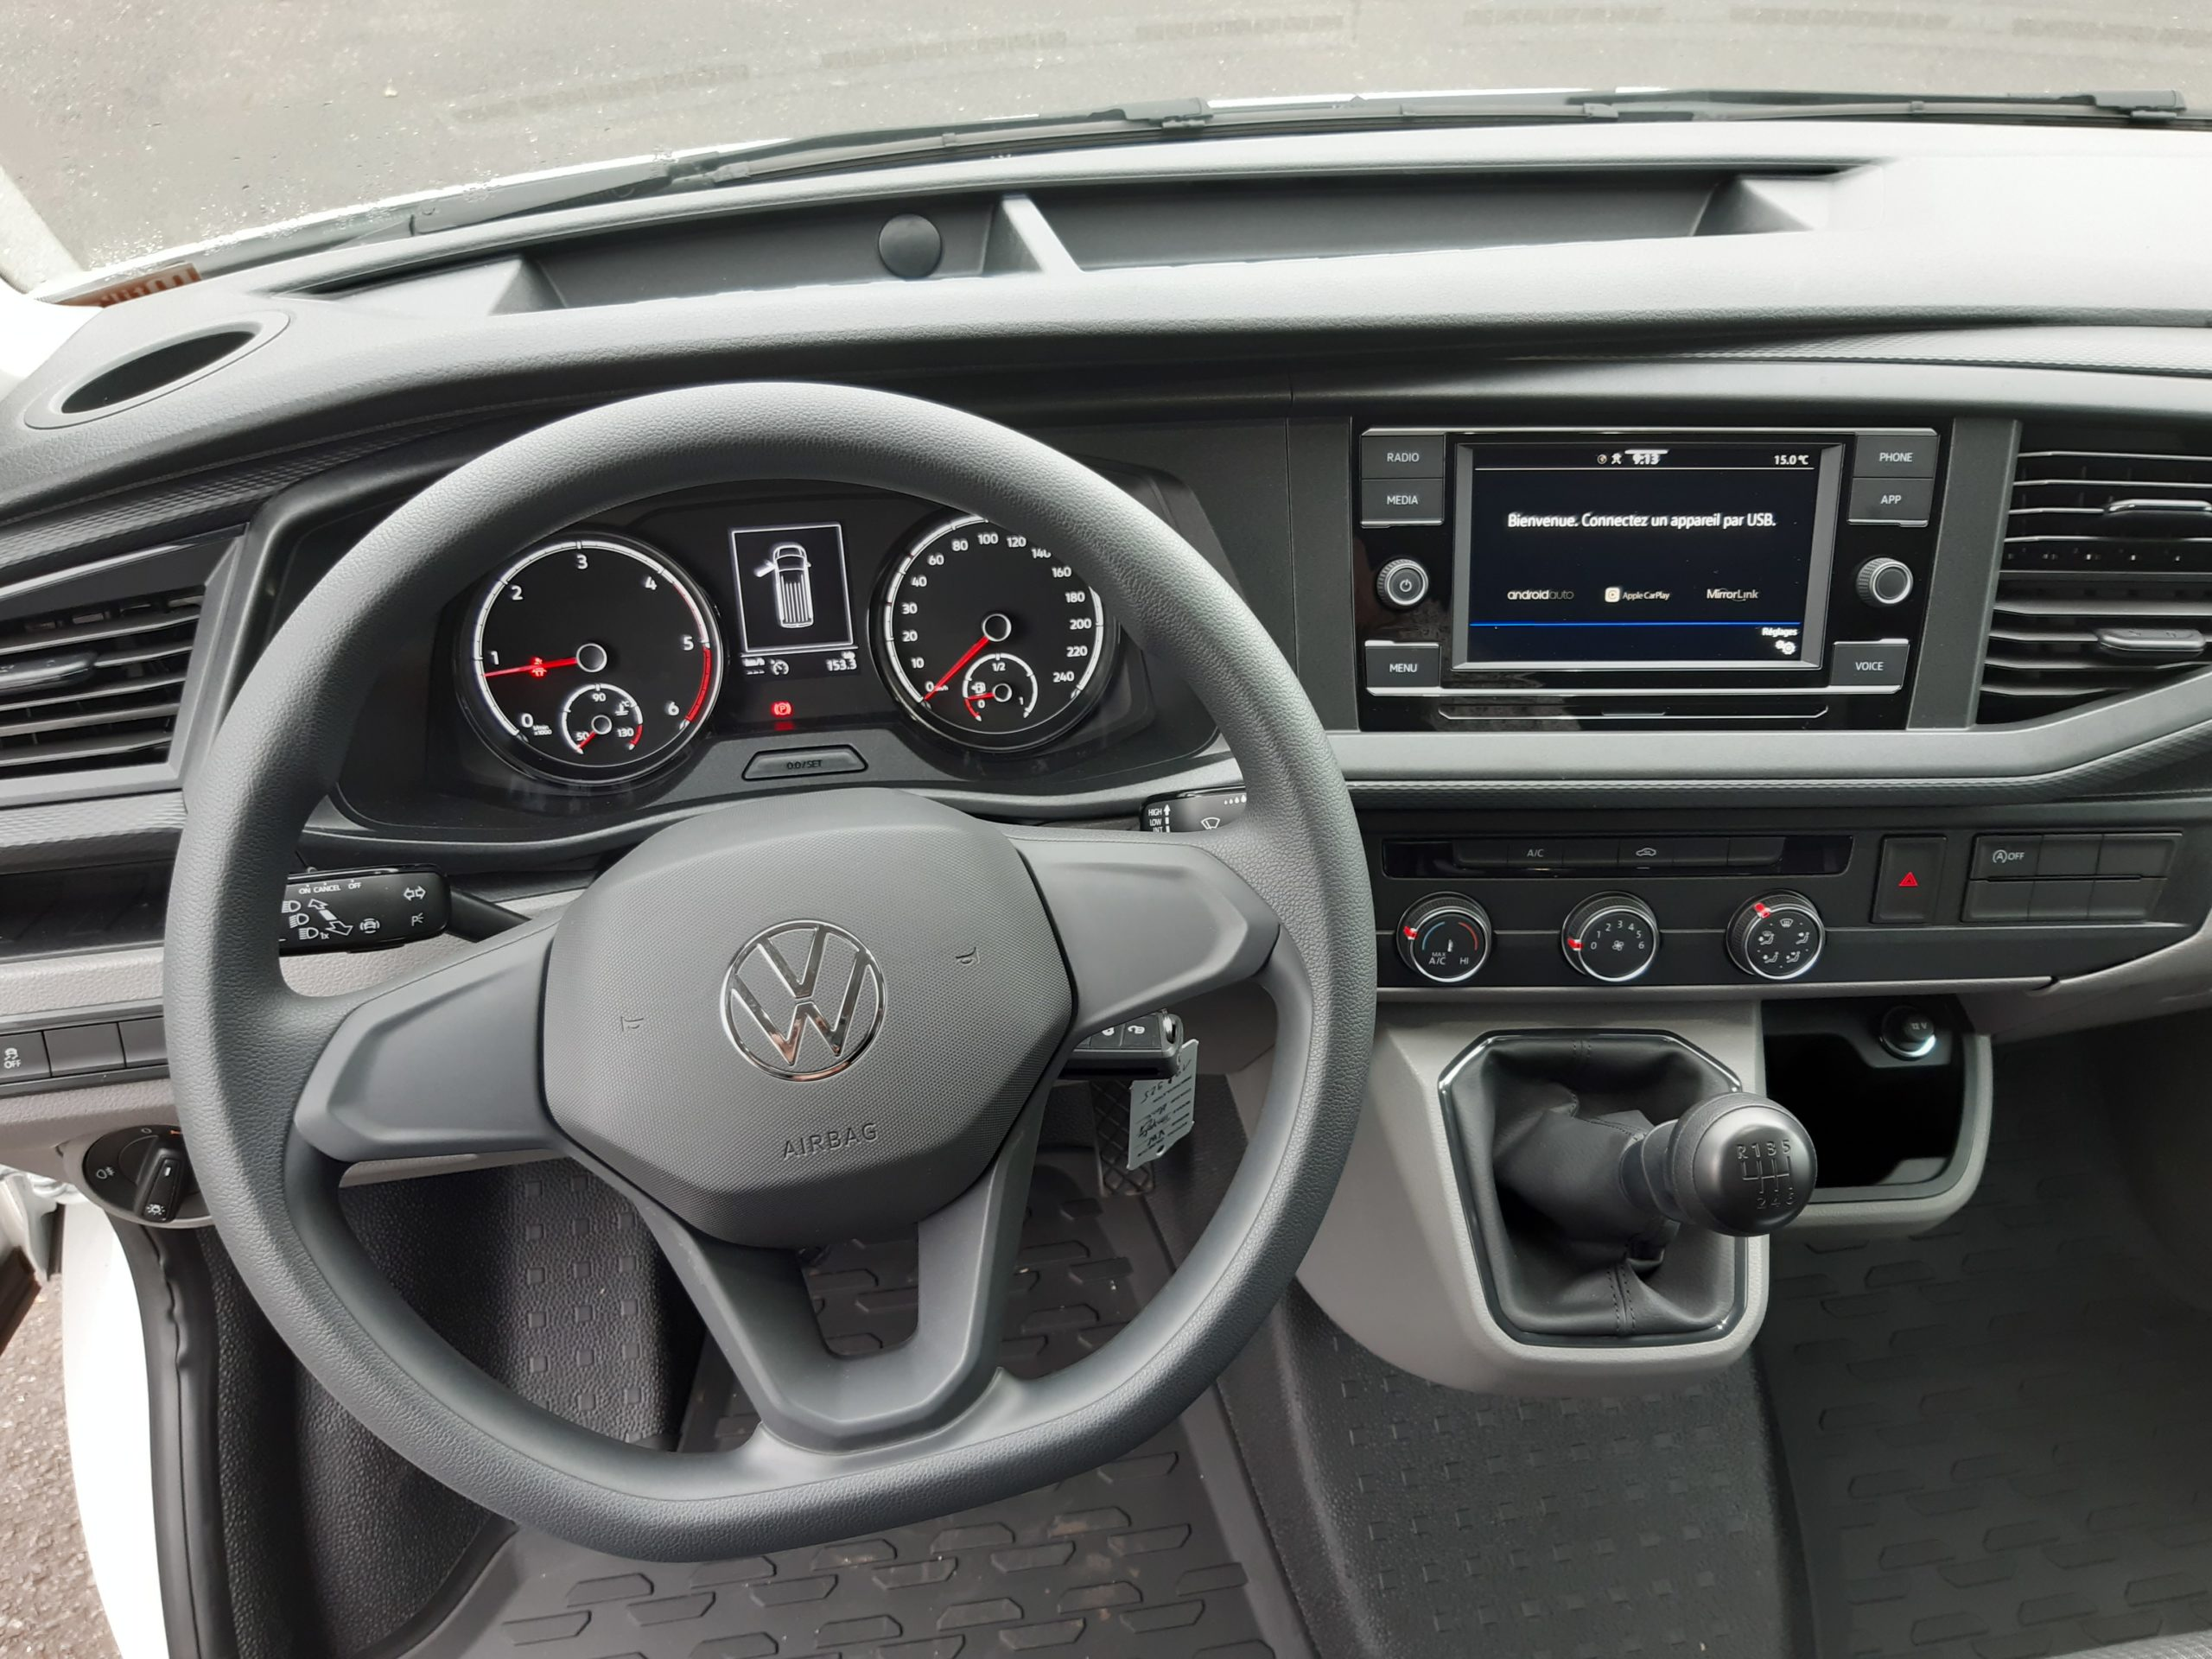 Location d'un fourgon compact double cabine - Volkswagen Transporter T6-1 - Vue8